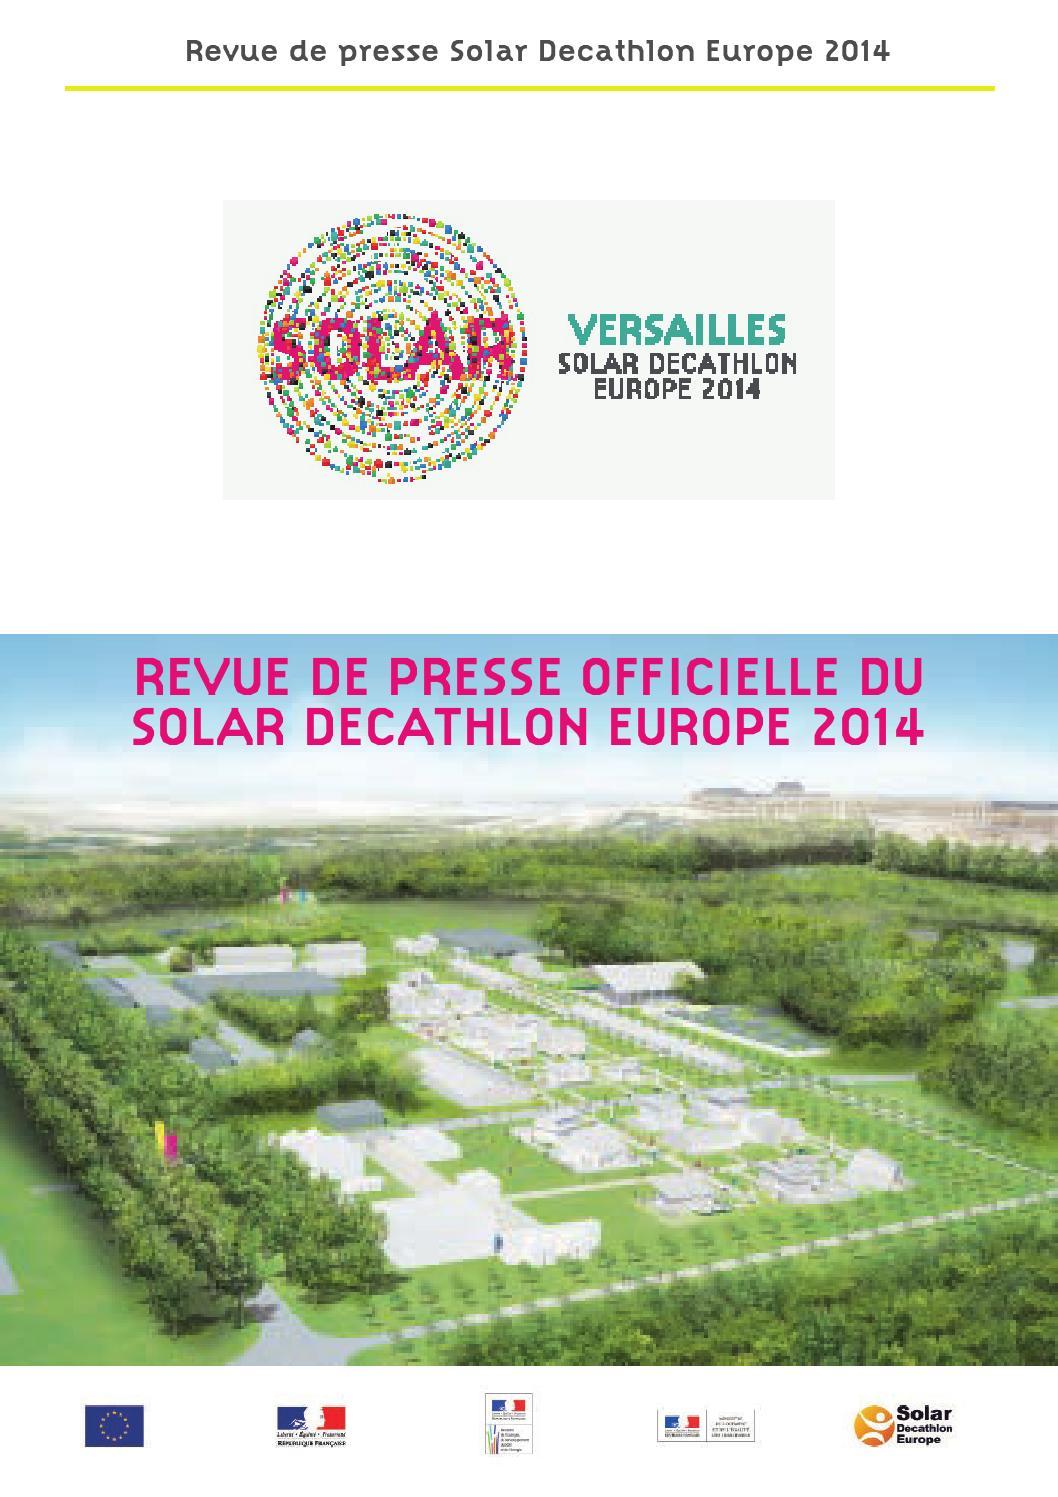 Revue de presse sde2014 by SD Europe - issuu 8b4f9e6bb6c